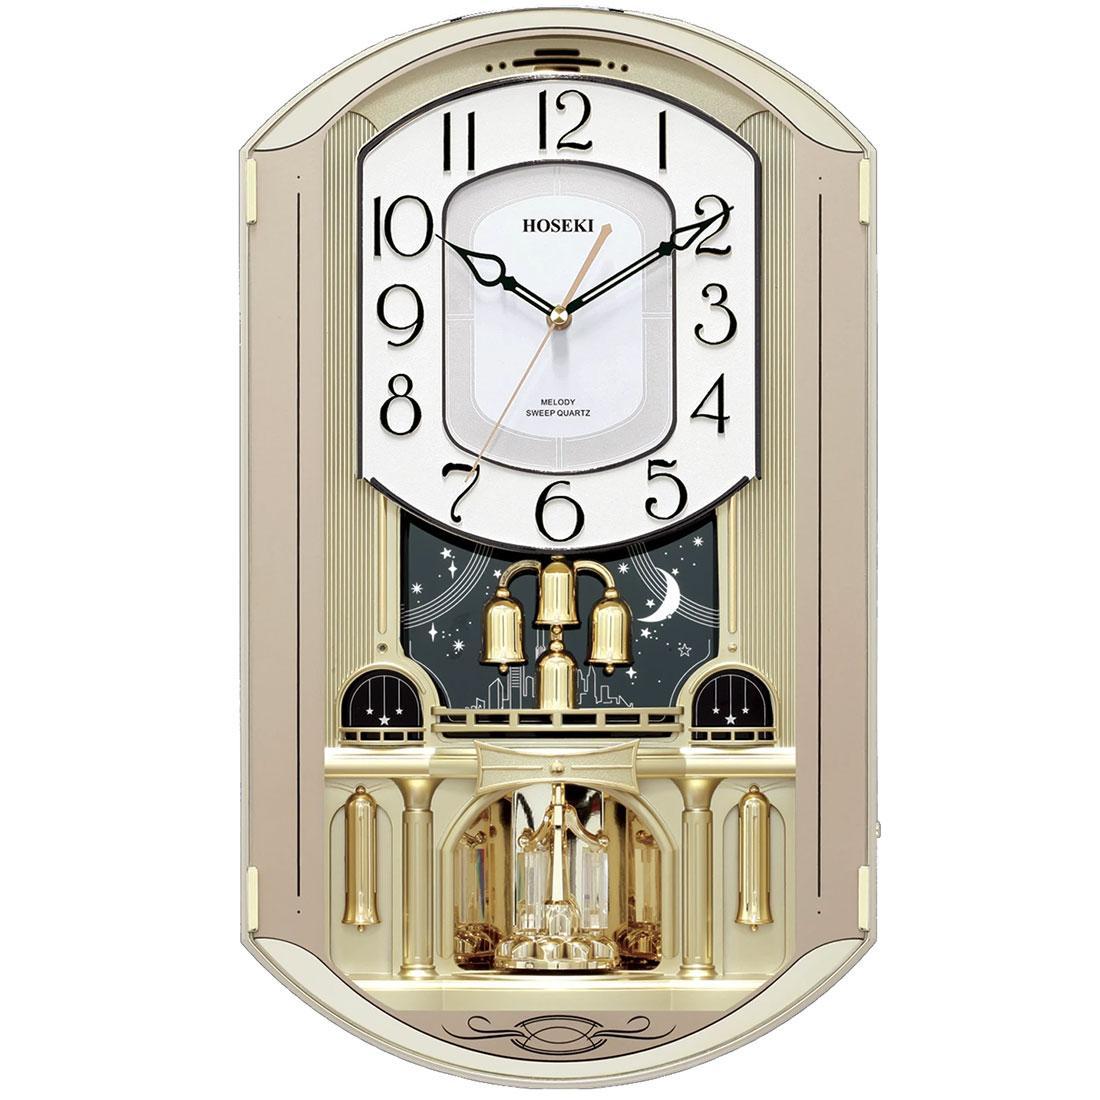 Hoseki H-9230 H-9230CH Champagne Melody Quartz Analog Wall Clock